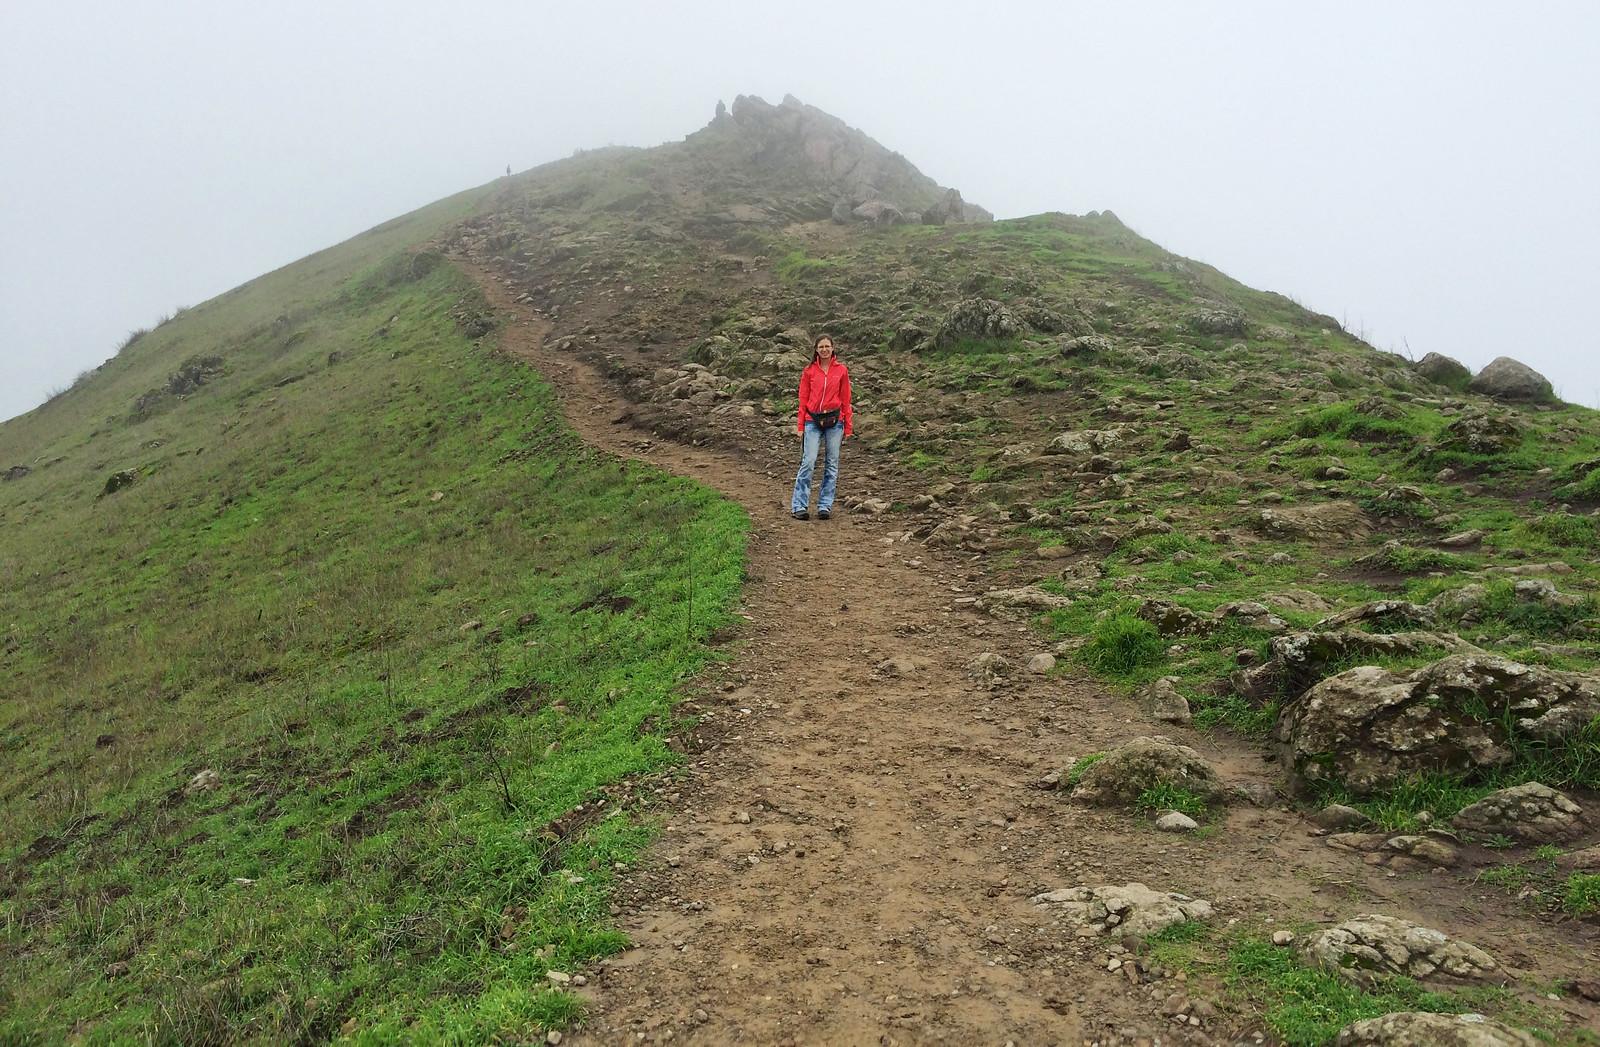 Mission Peak, California, USA